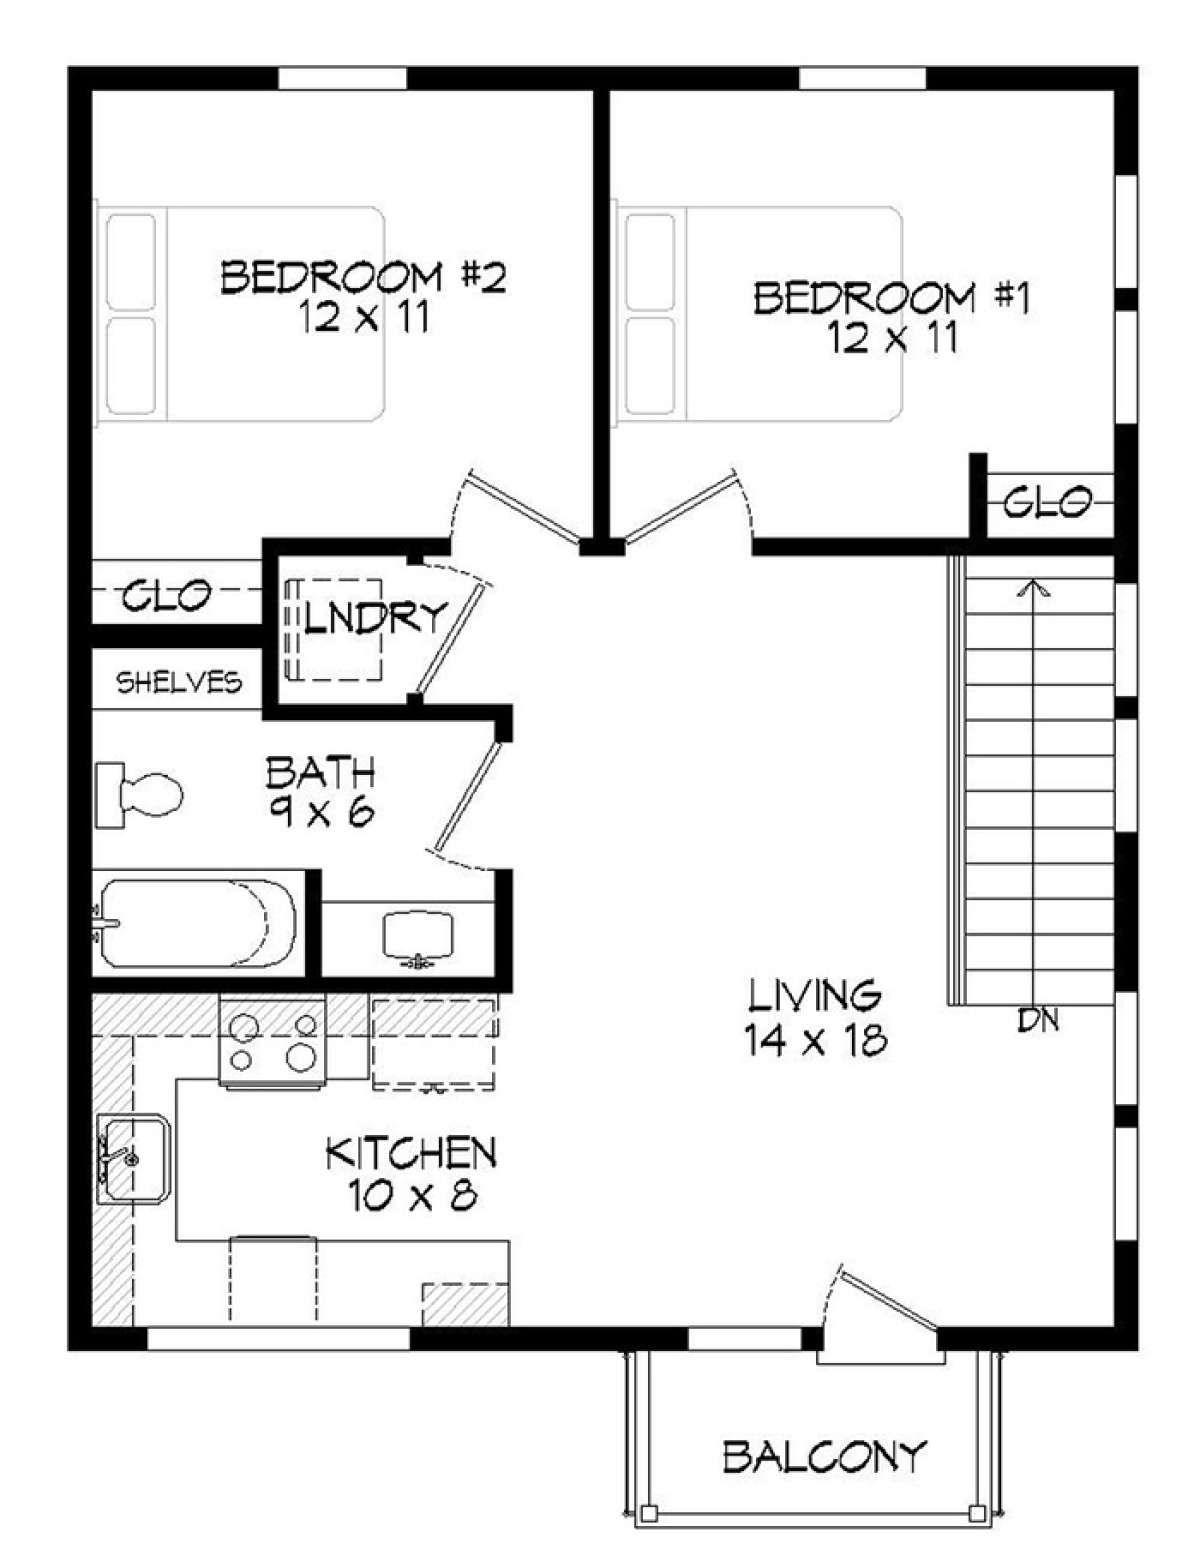 House Plan 94000043 Modern Plan 820 Square Feet, 2